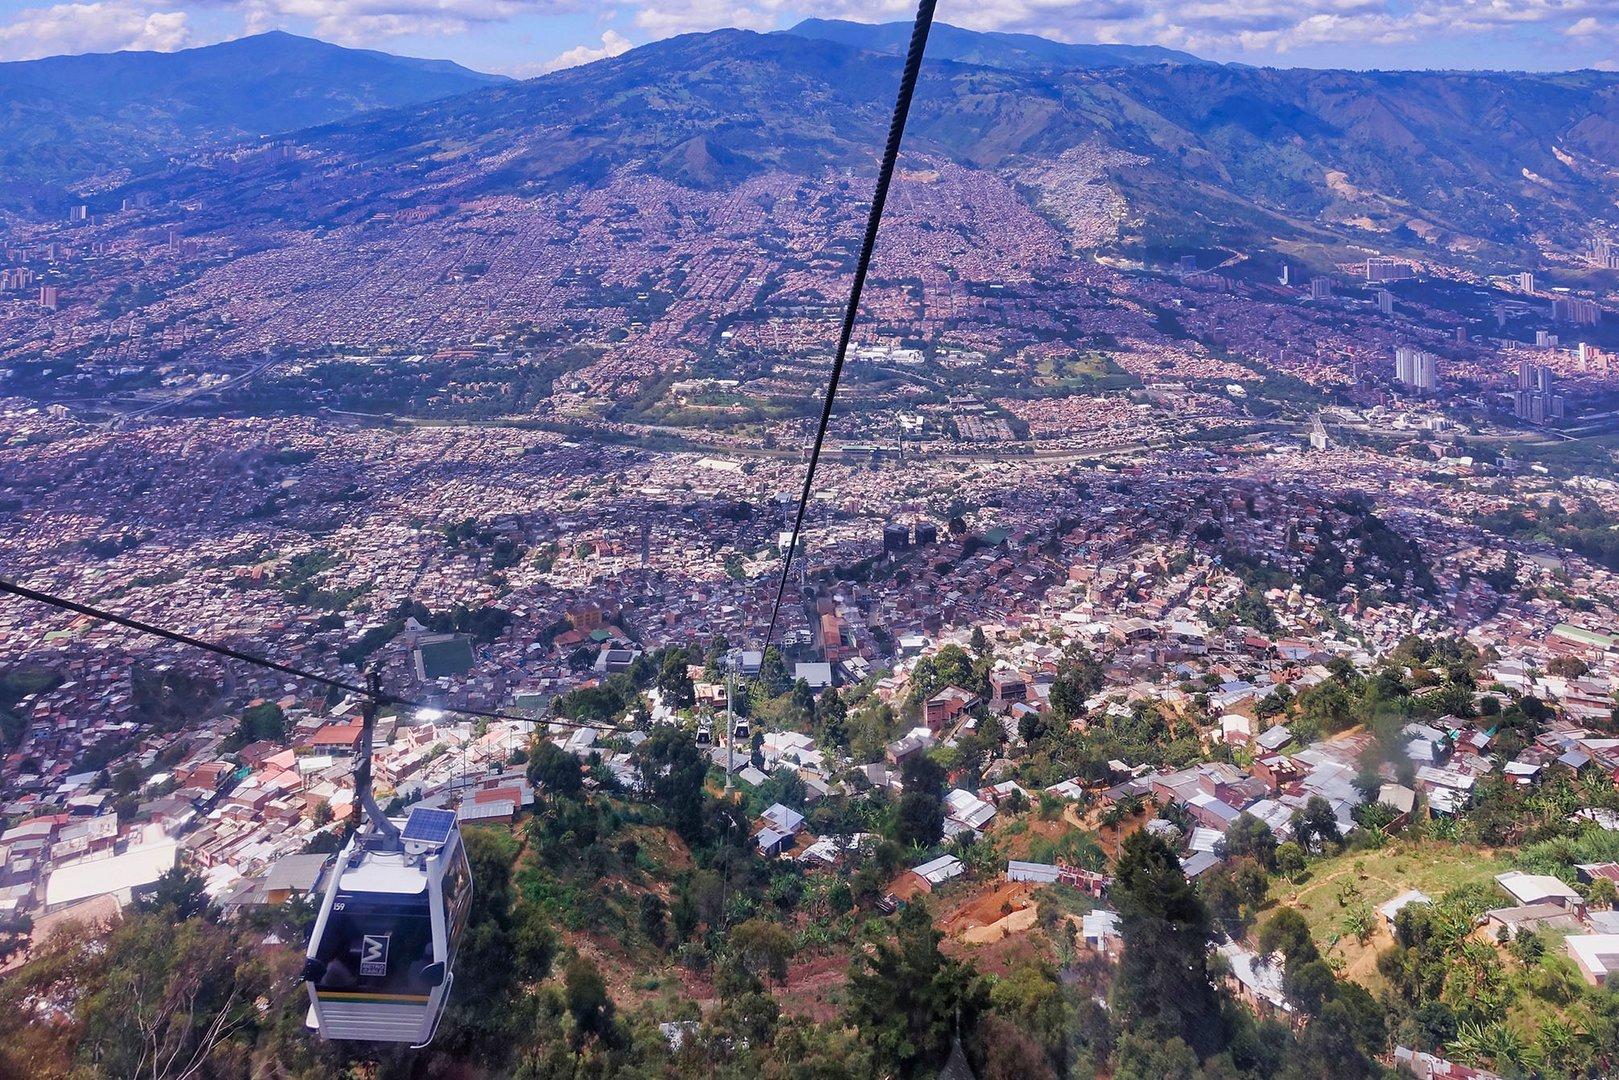 2018.12.31, Medellin, Colombia